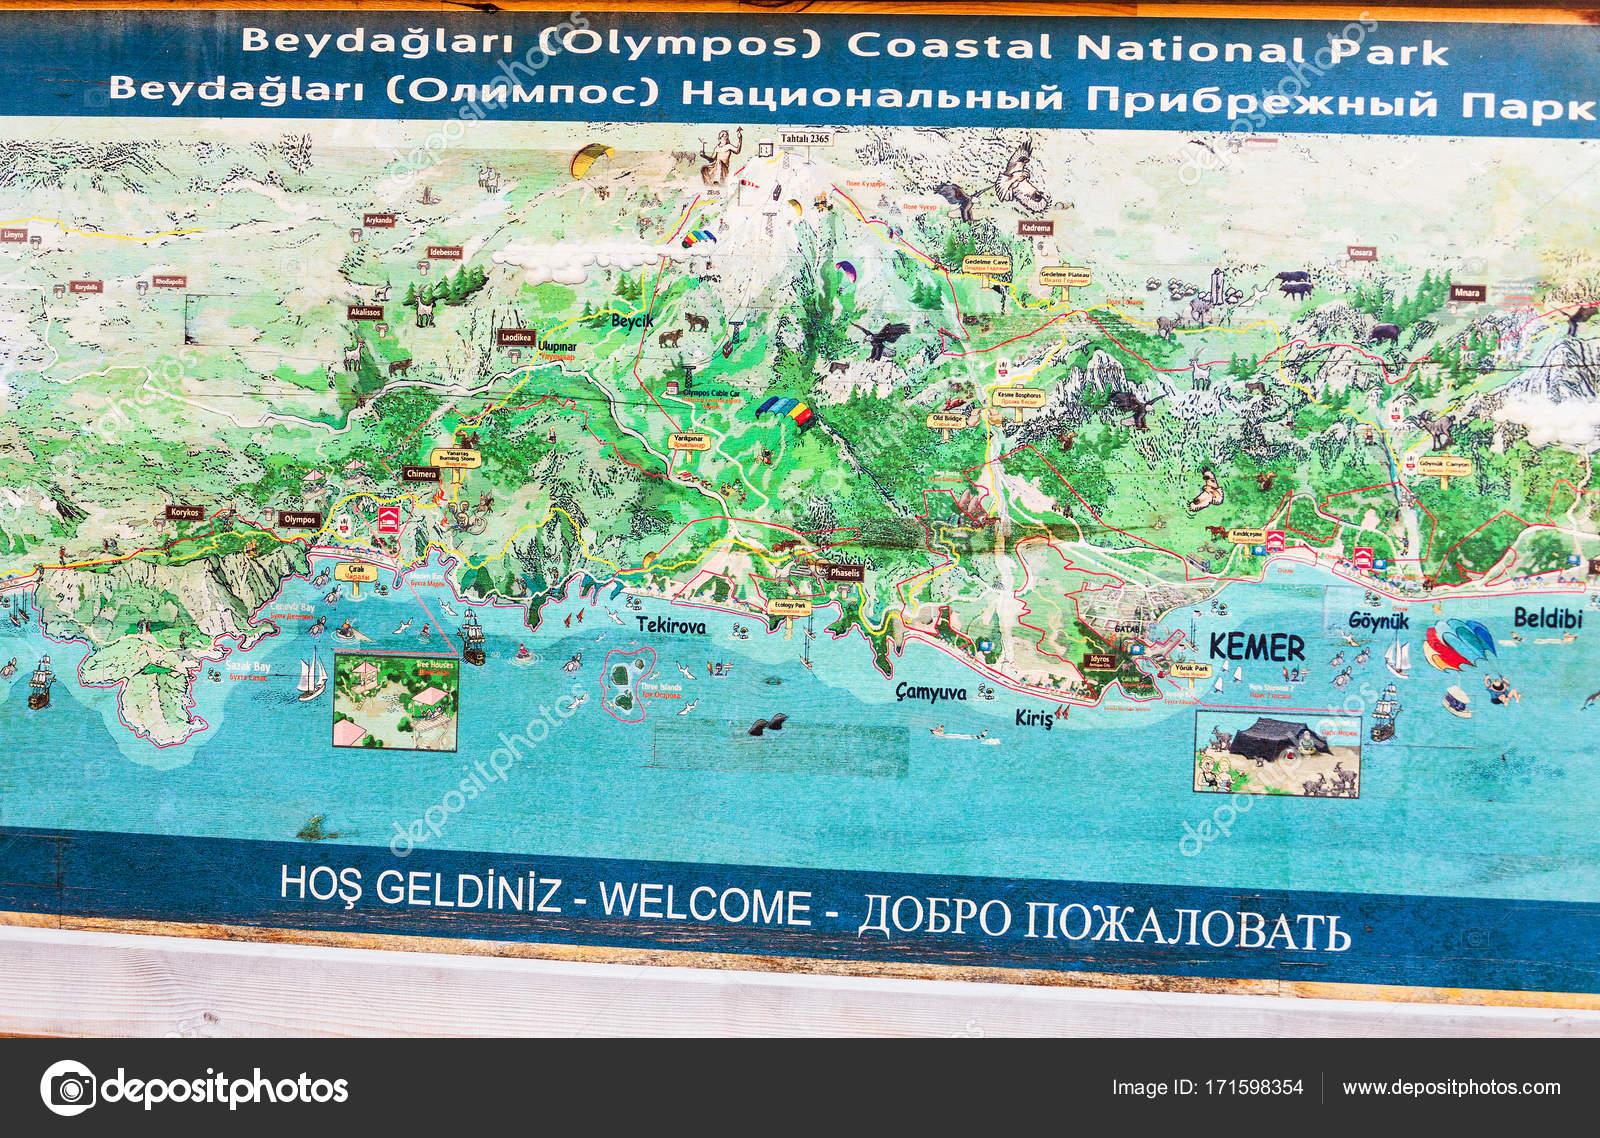 15 september 2017 chirali turkey stylized antique tourist map of 15 september 2017 chirali turkey stylized antique tourist map of the mediterranean coast of turkey photo by frantic00 publicscrutiny Choice Image